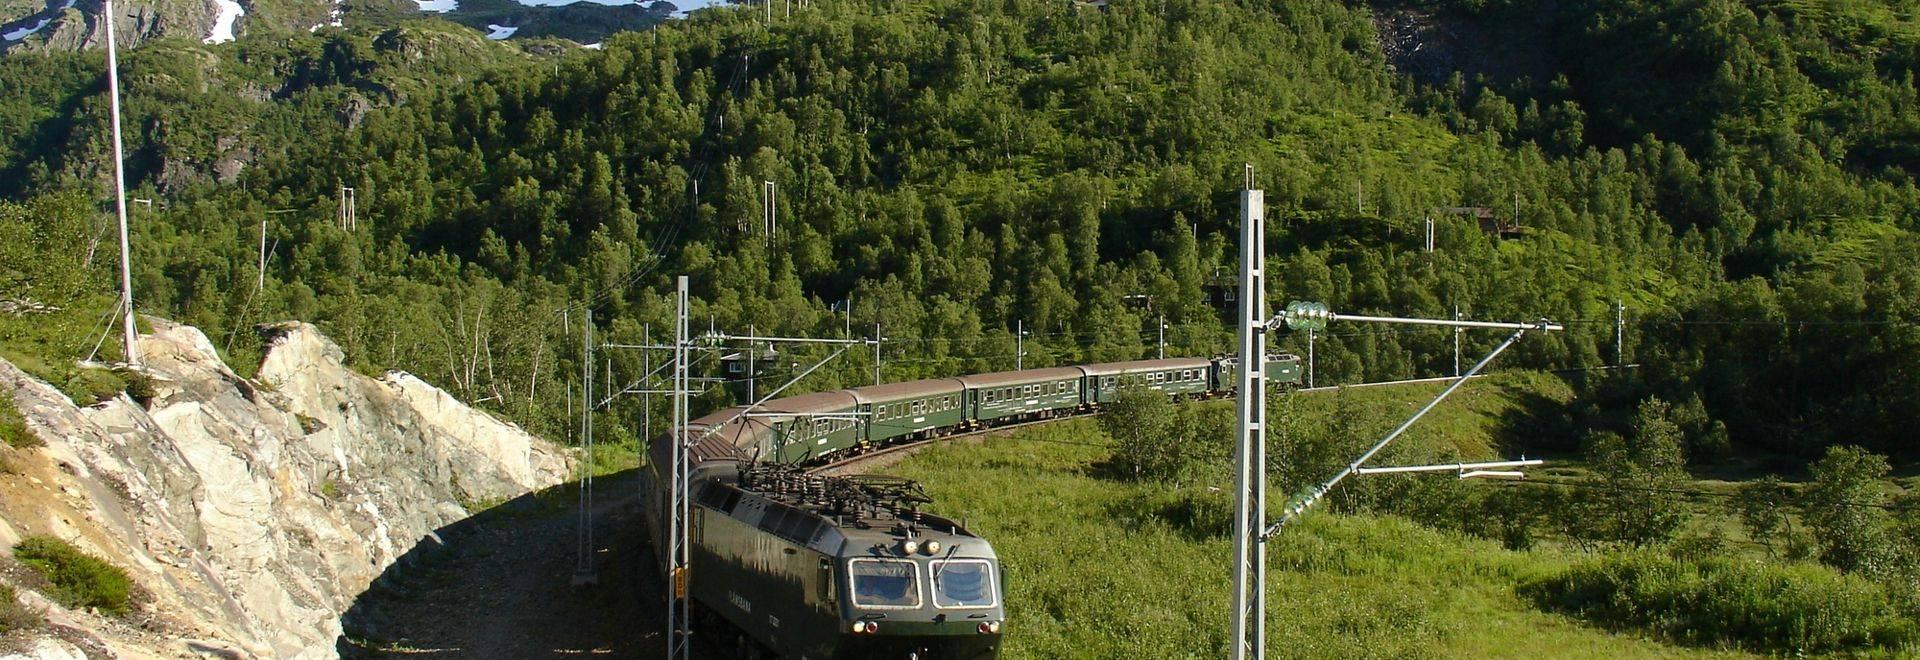 Dreamstime M 24308438 Flam Railway